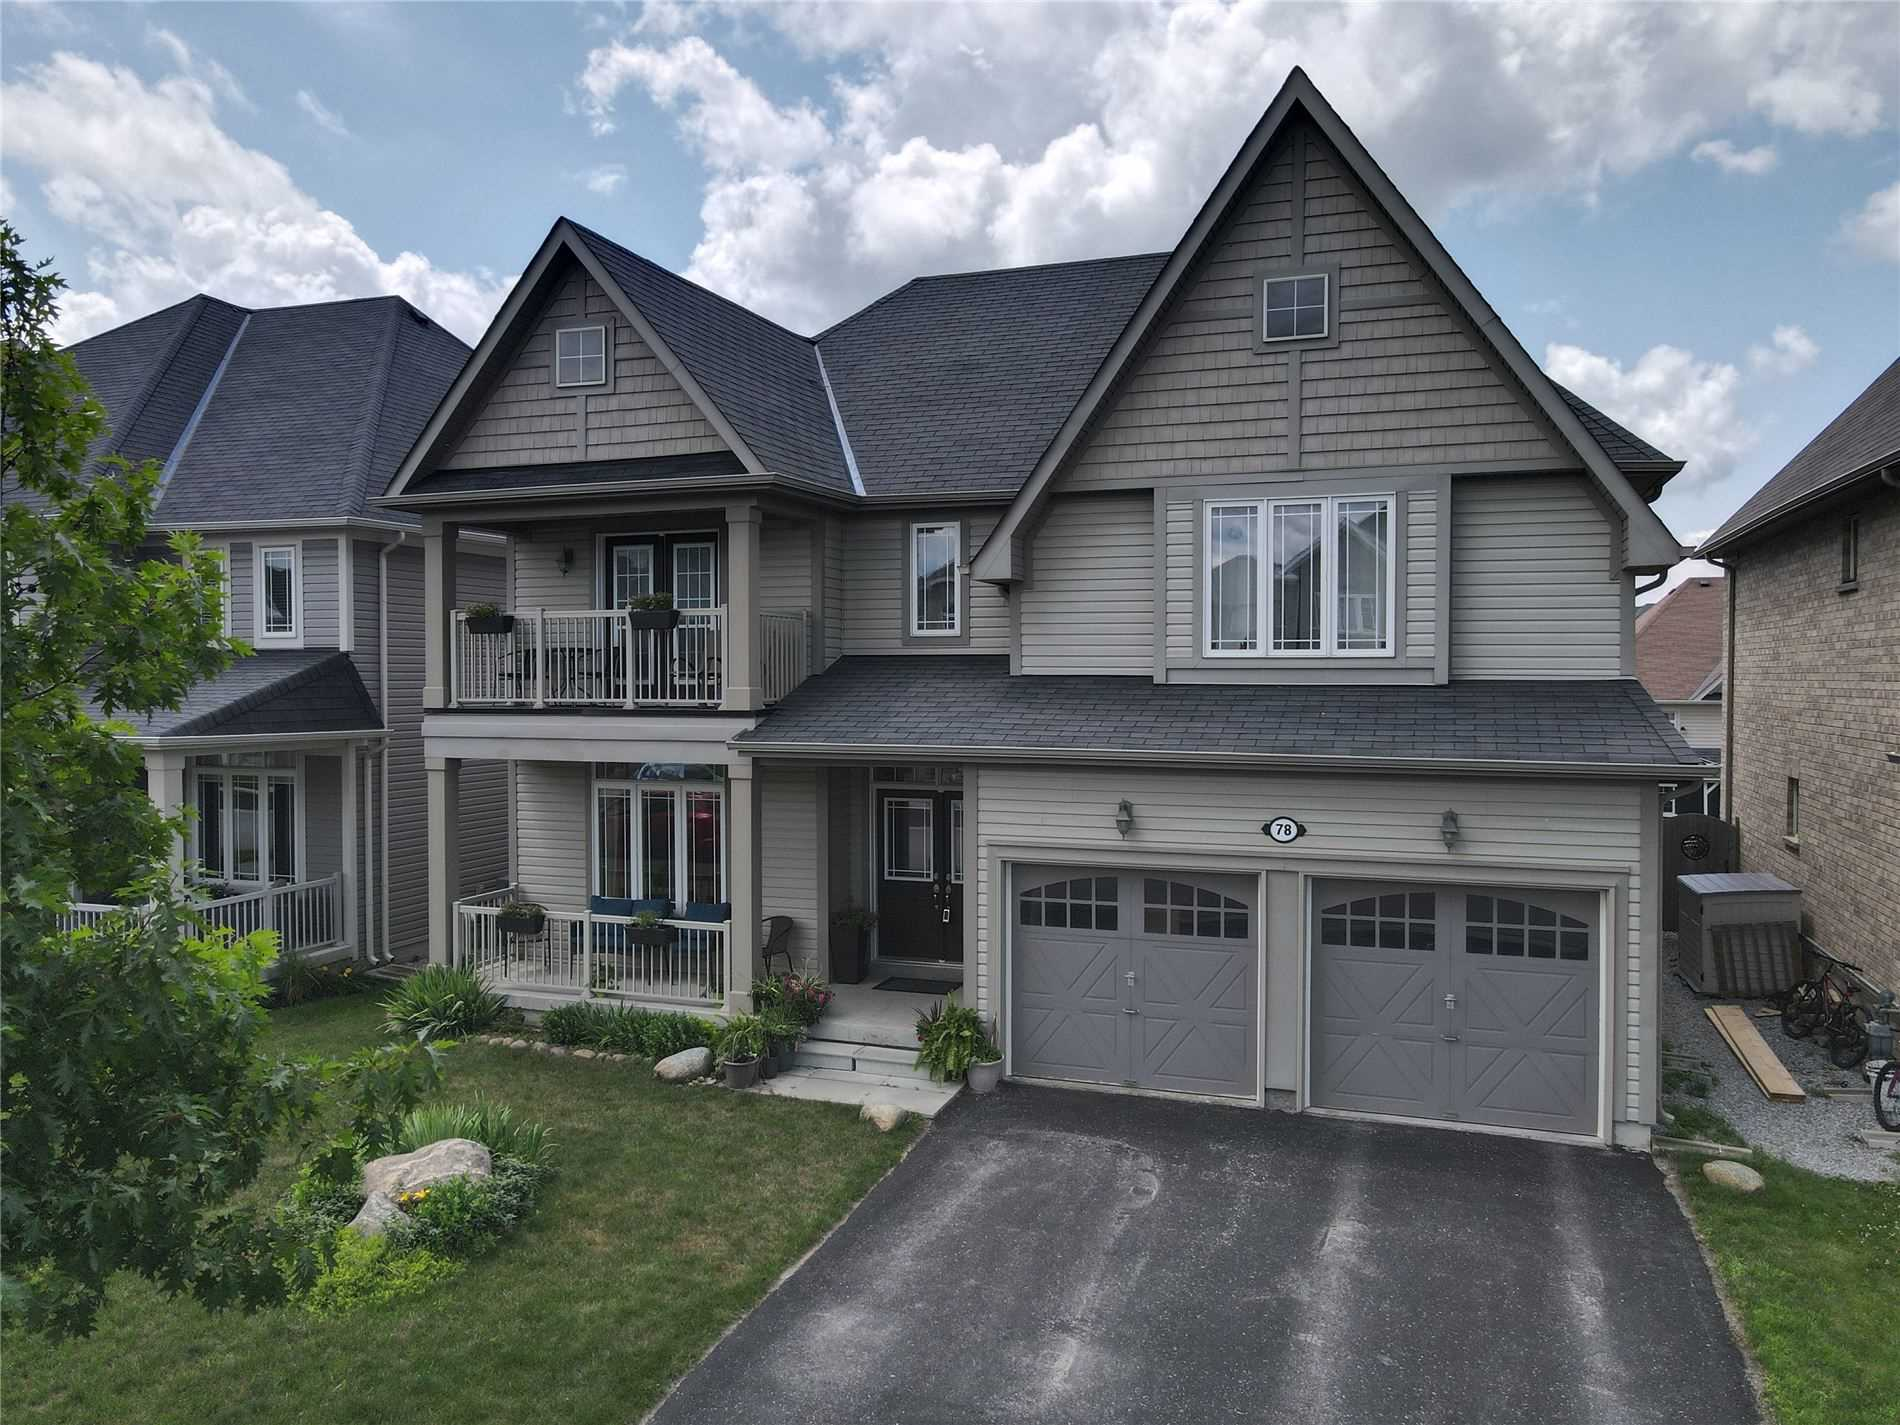 Detached house For Sale In Georgina - 78 Wyndham Circ, Georgina, Ontario, Canada L0E1R0 , 4 Bedrooms Bedrooms, ,6 BathroomsBathrooms,Detached,For Sale,Wyndham